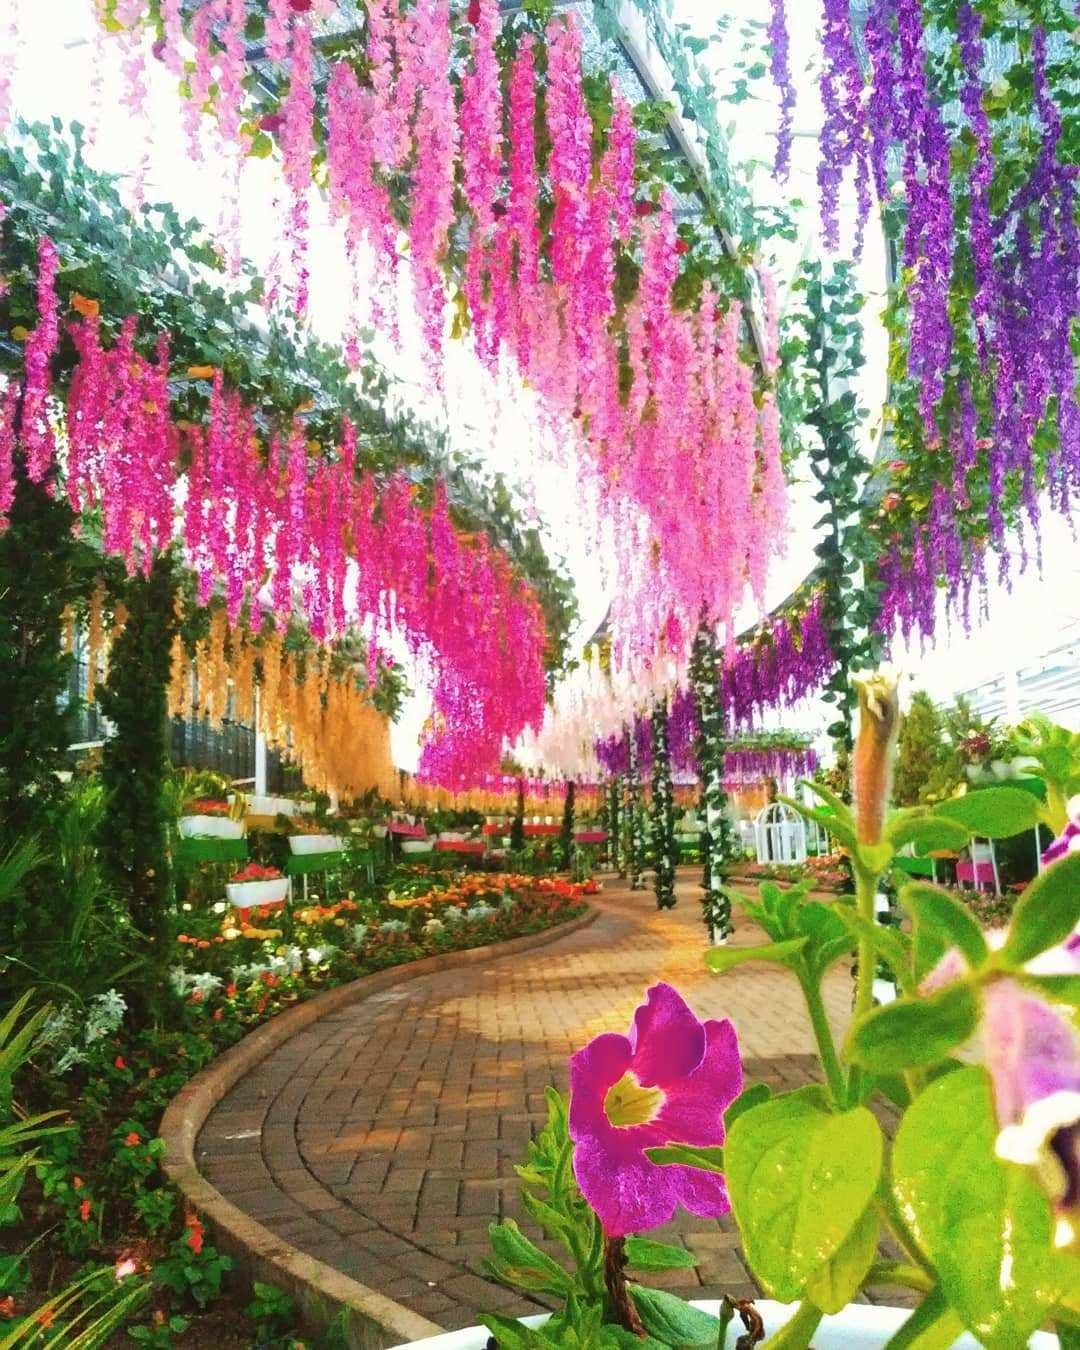 Warna warni bunga di wisata Florawisata San Terra Malang, Image From @florawisata.santerra